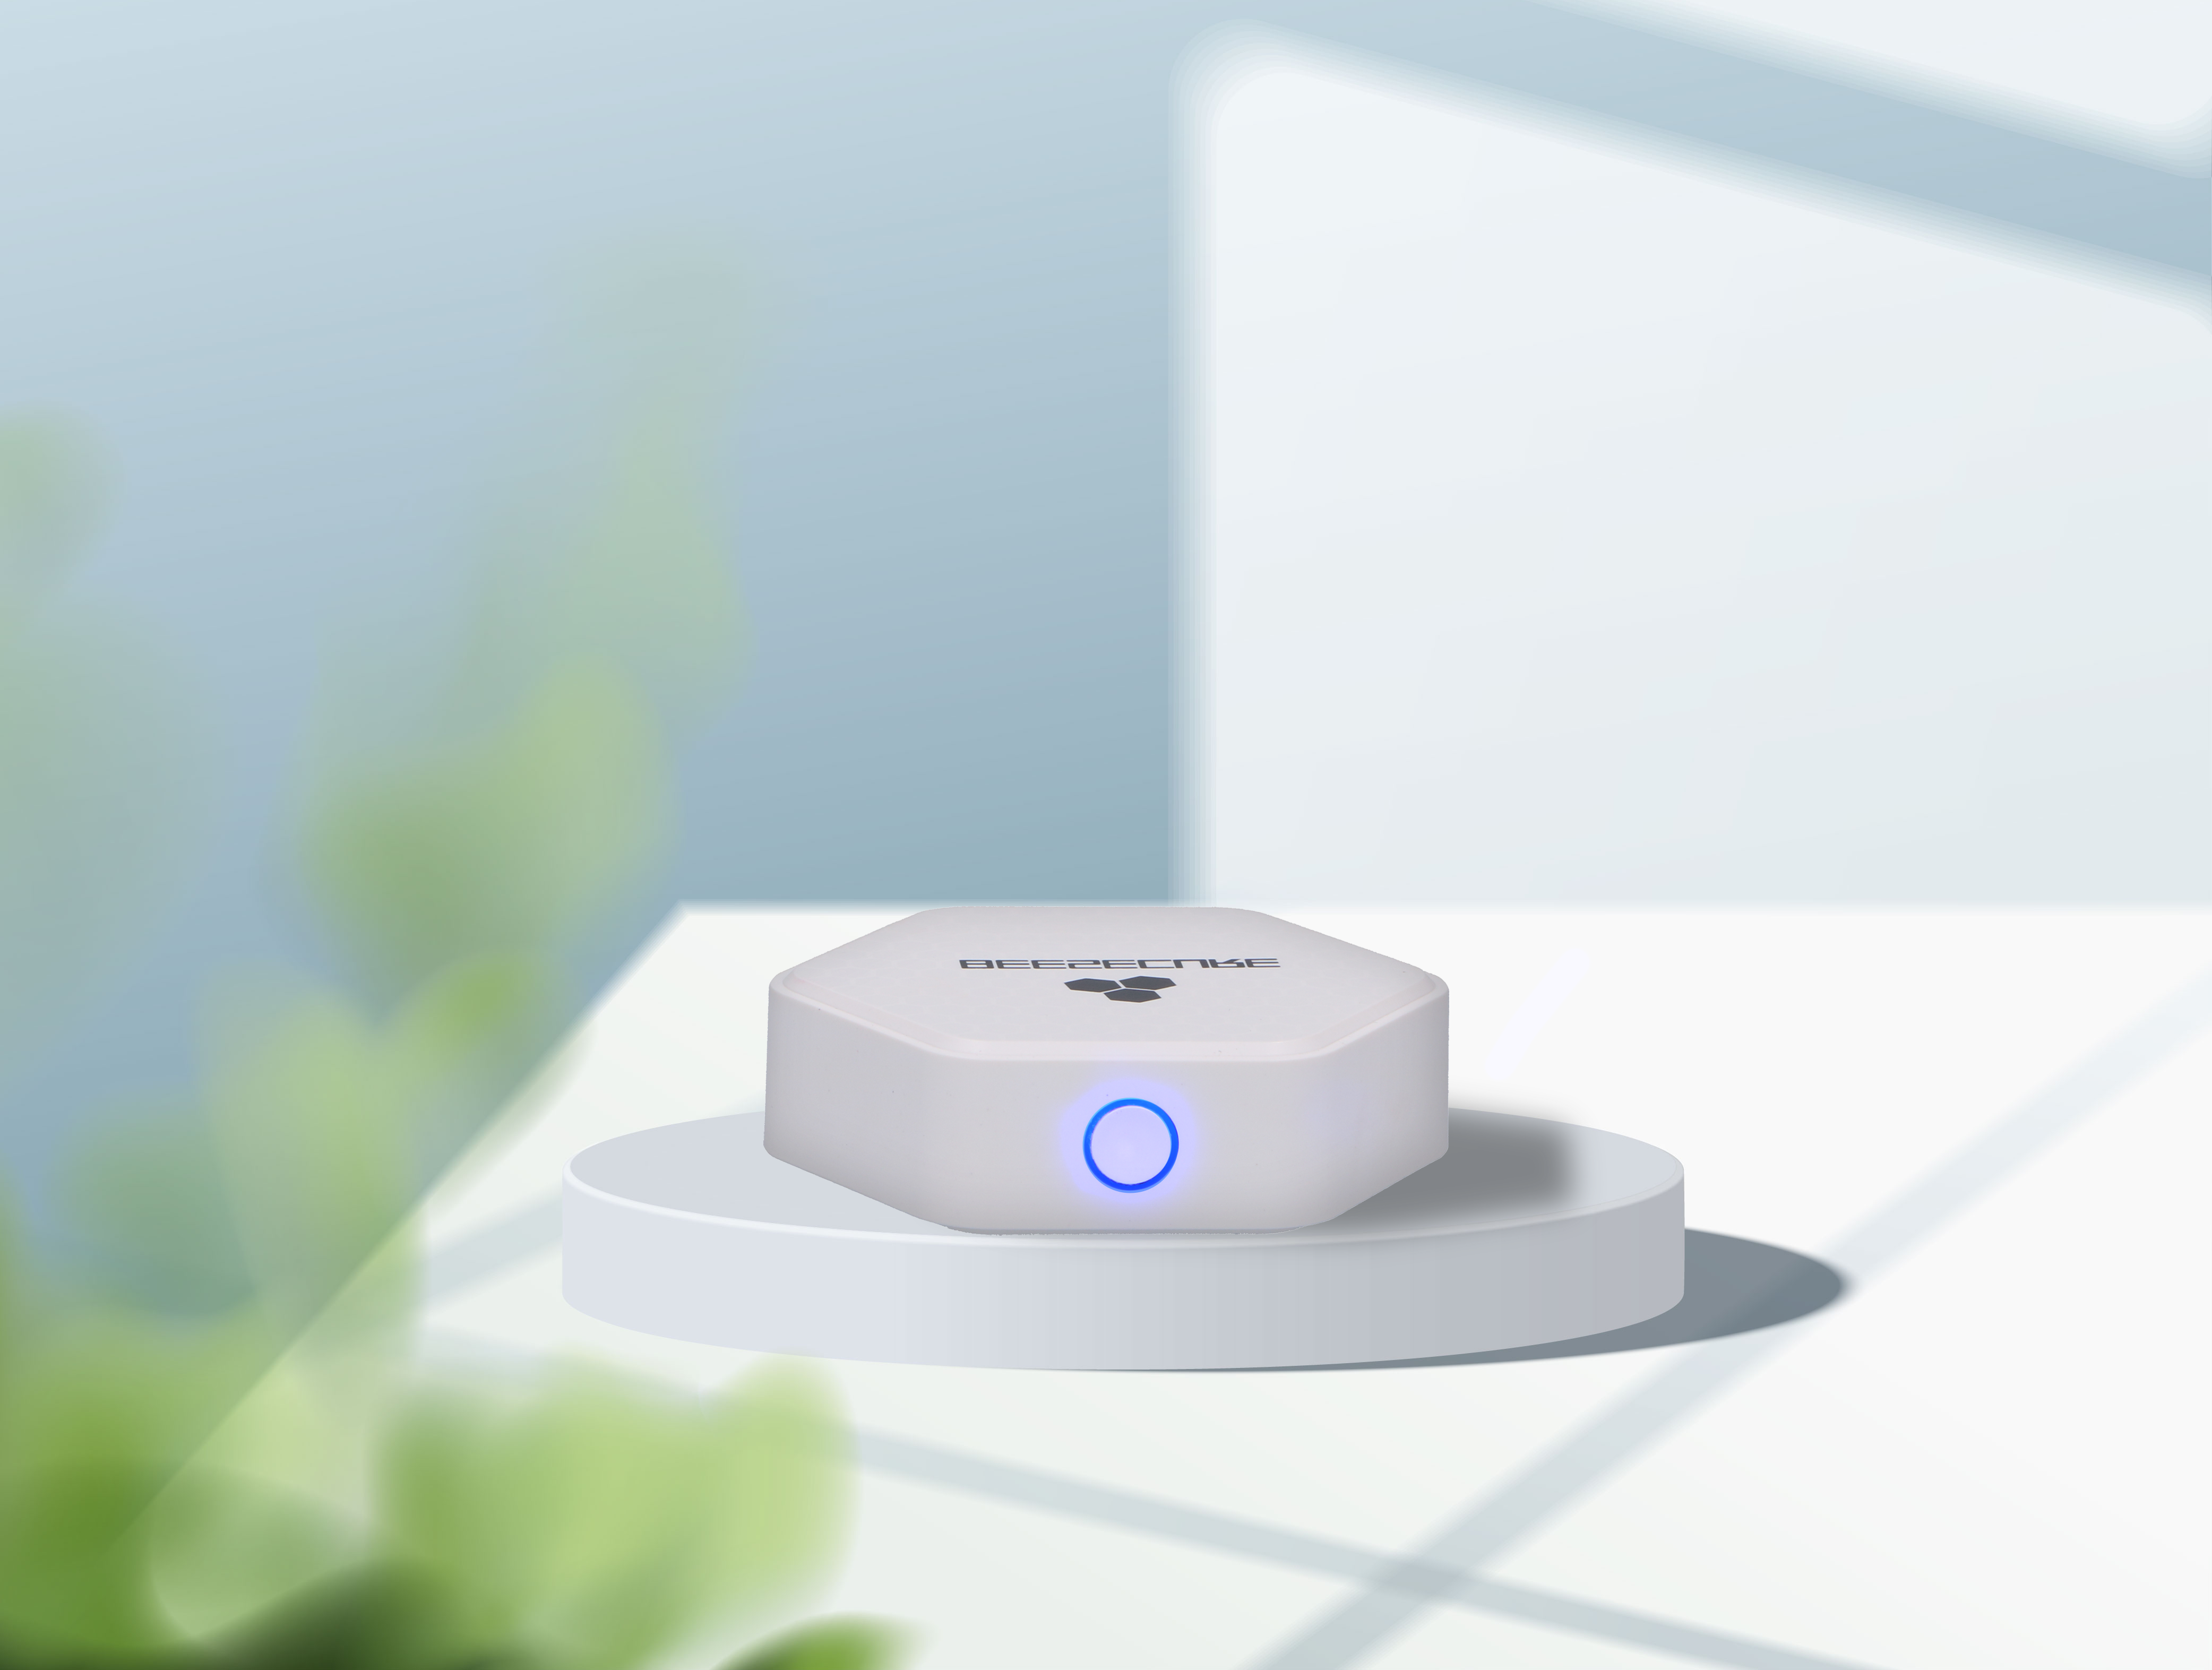 BeeSecure smart hub